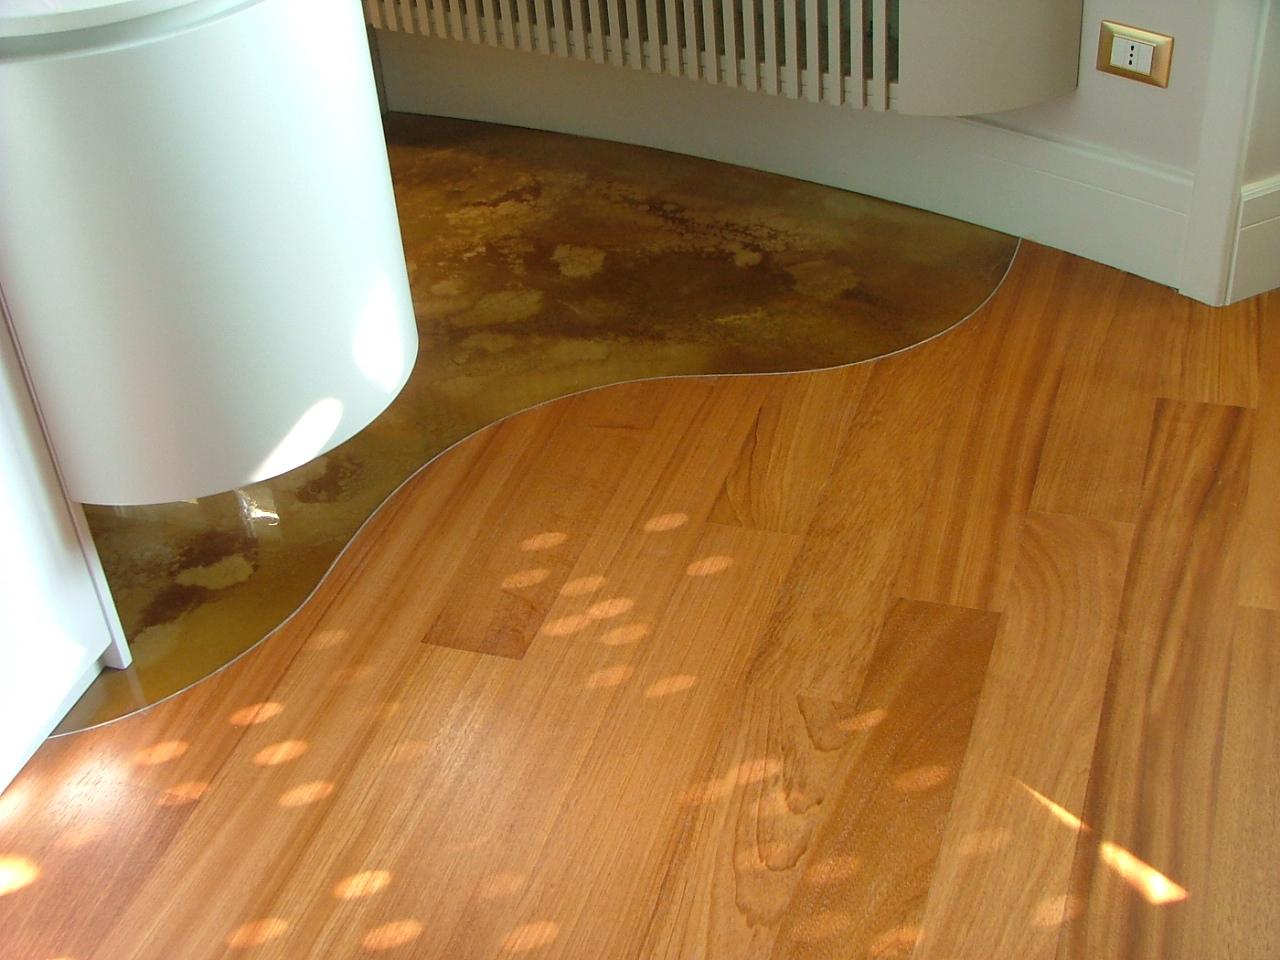 parquet resine good cire rsine dure blanche pour parquet with parquet resine parquet e resine. Black Bedroom Furniture Sets. Home Design Ideas